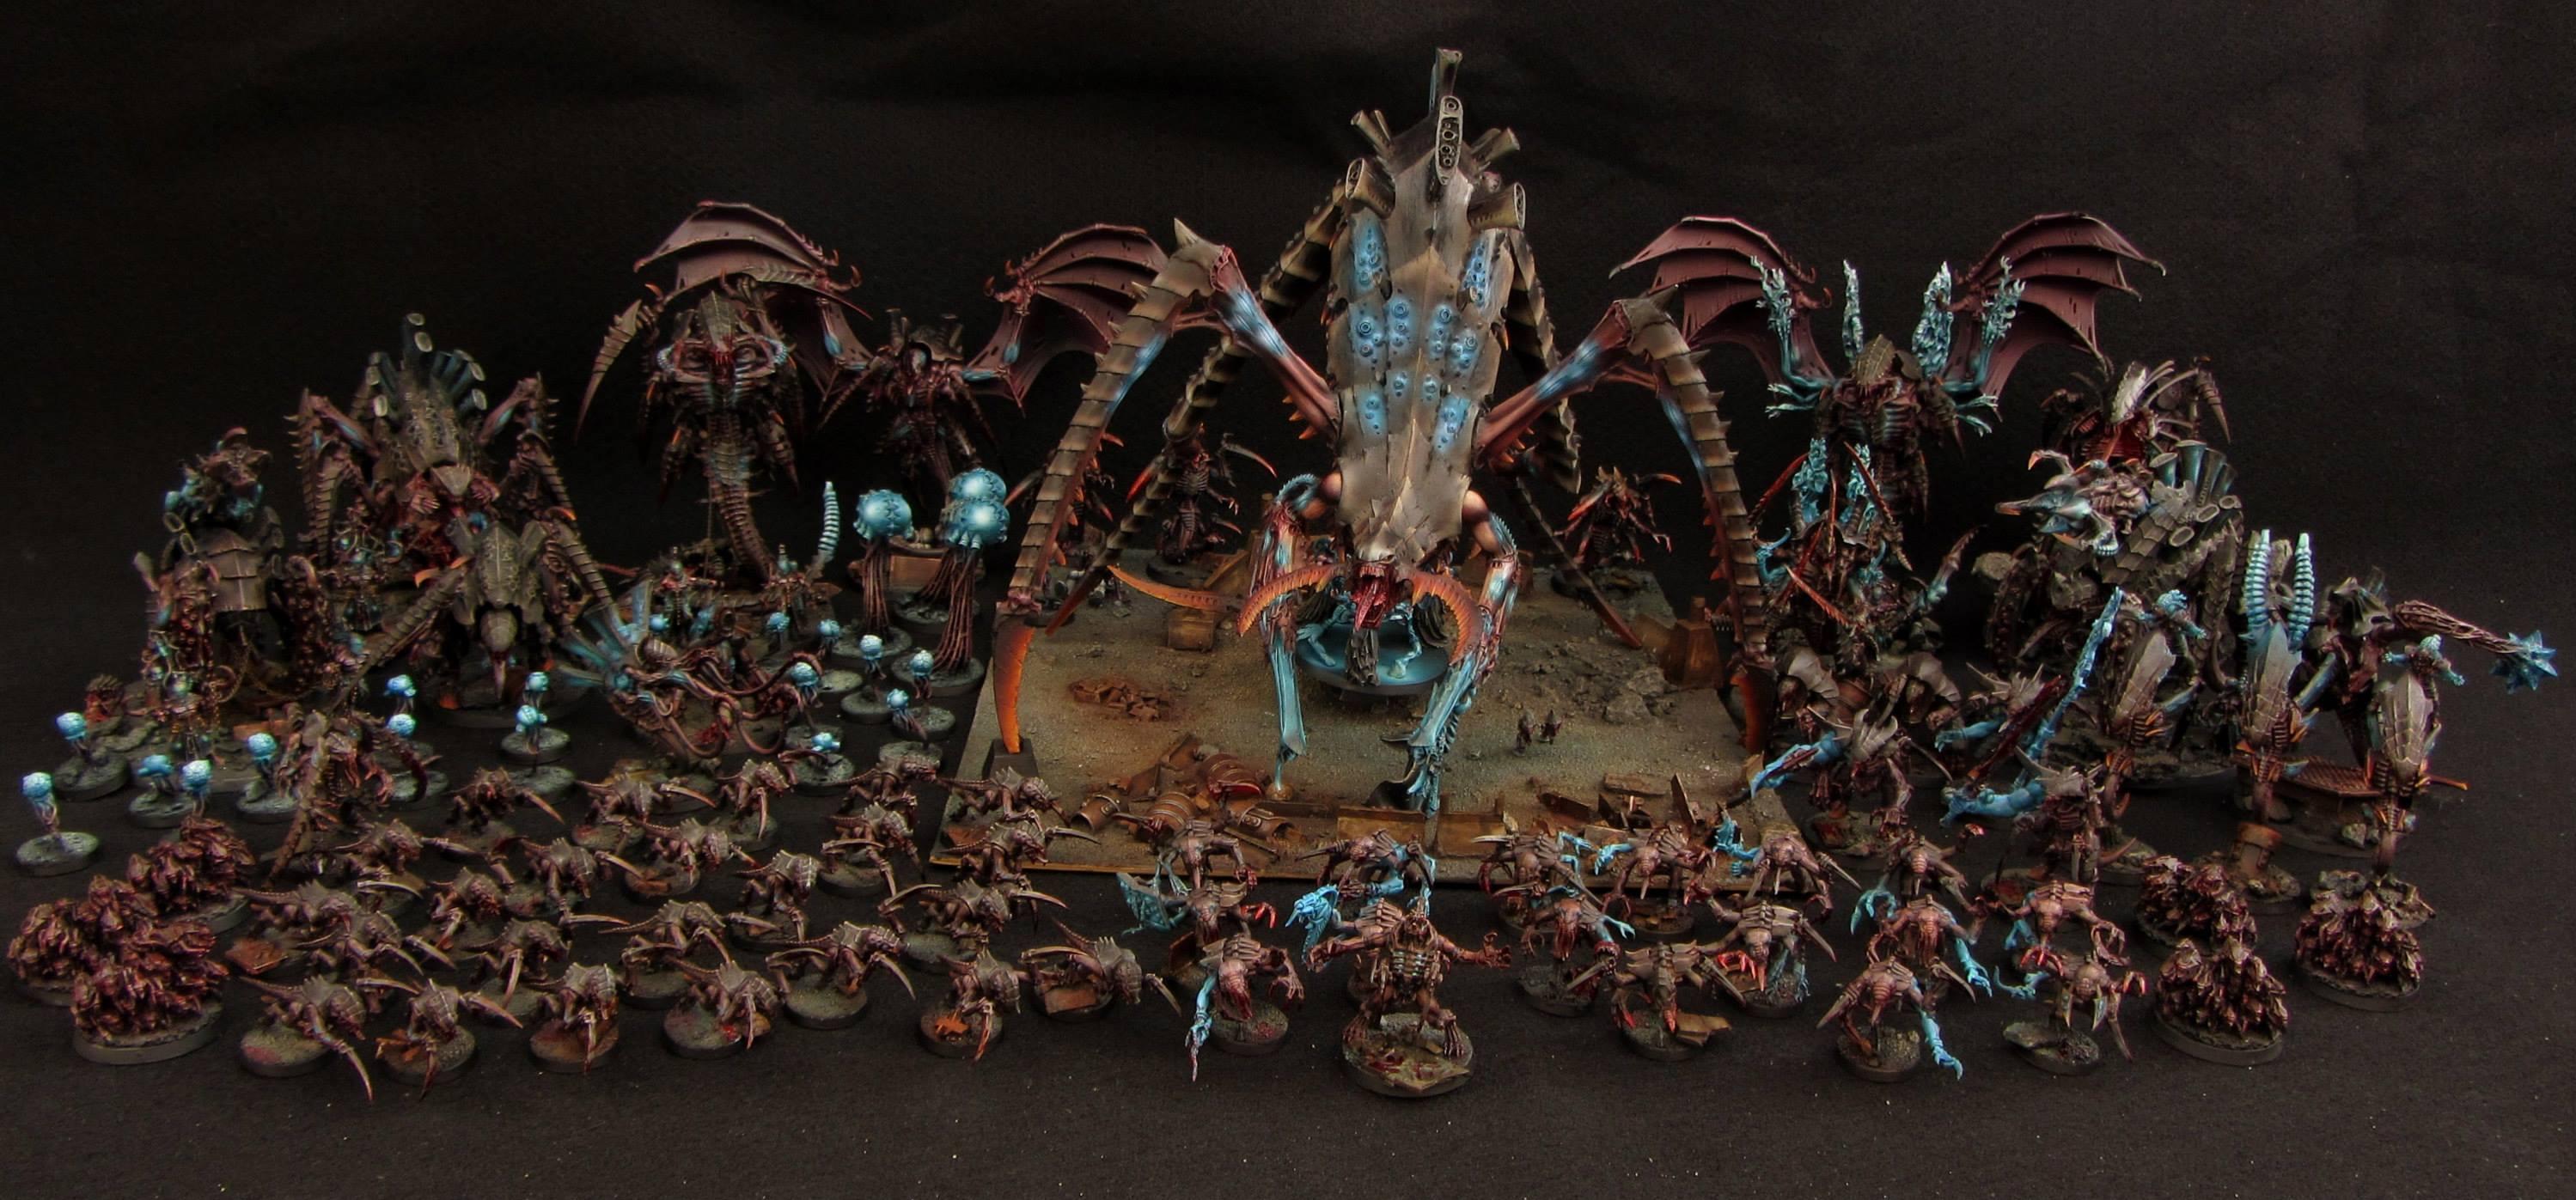 Tyranid army (with Hierophant biotytan)